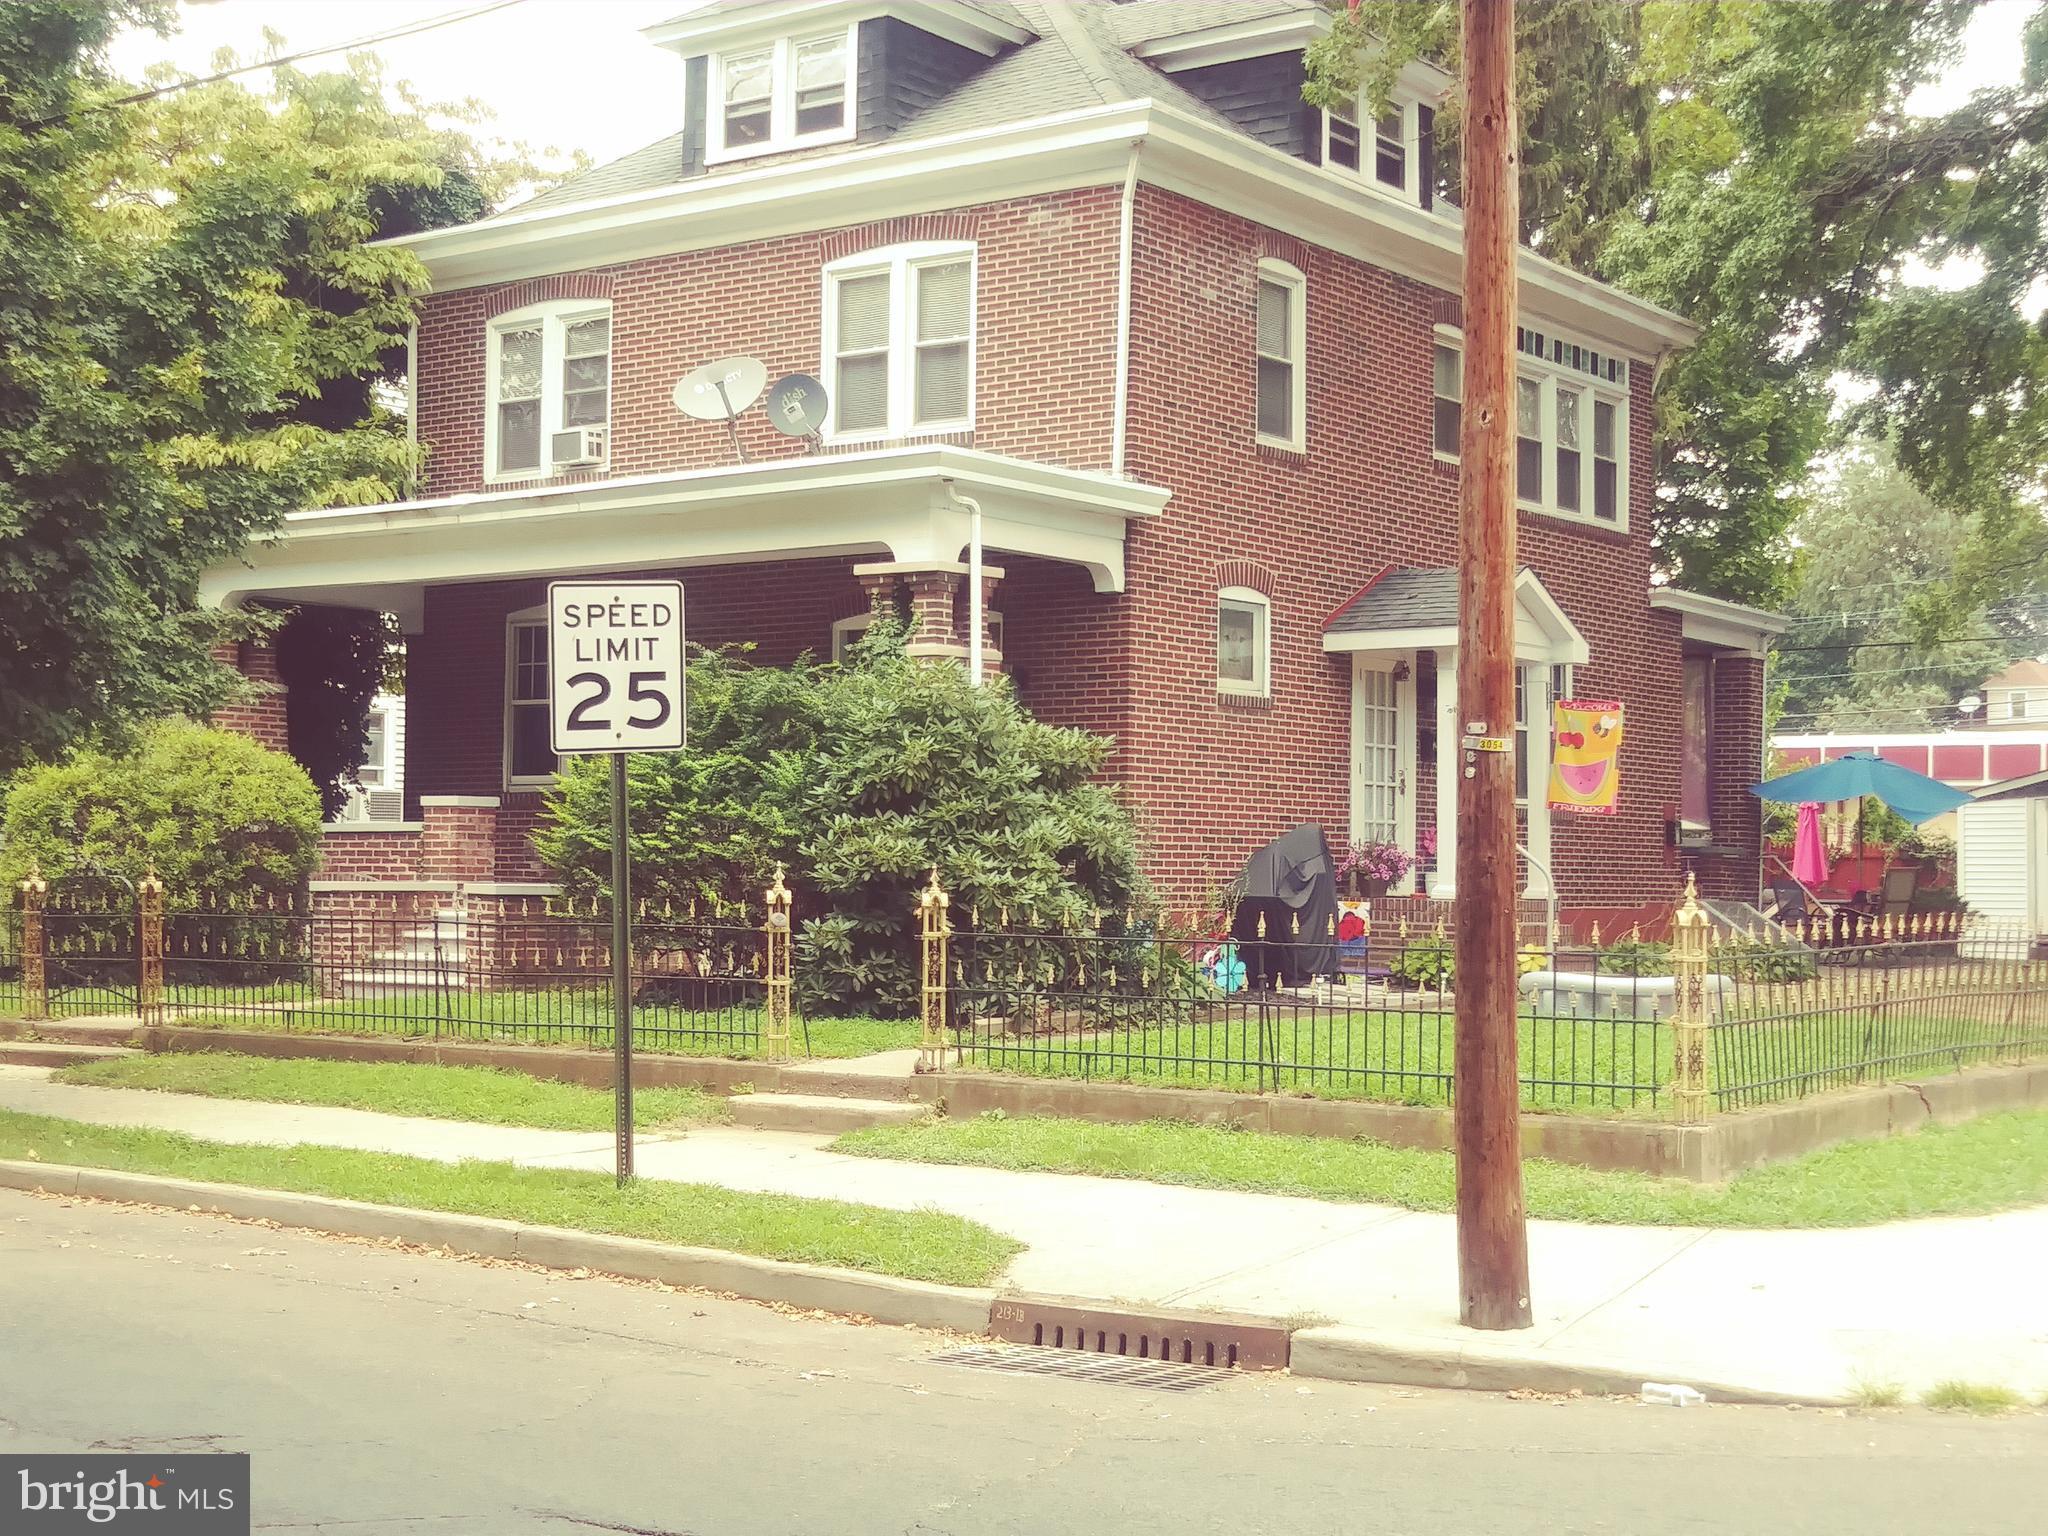 954 FRANKLIN STREET, TRENTON, NJ 08610